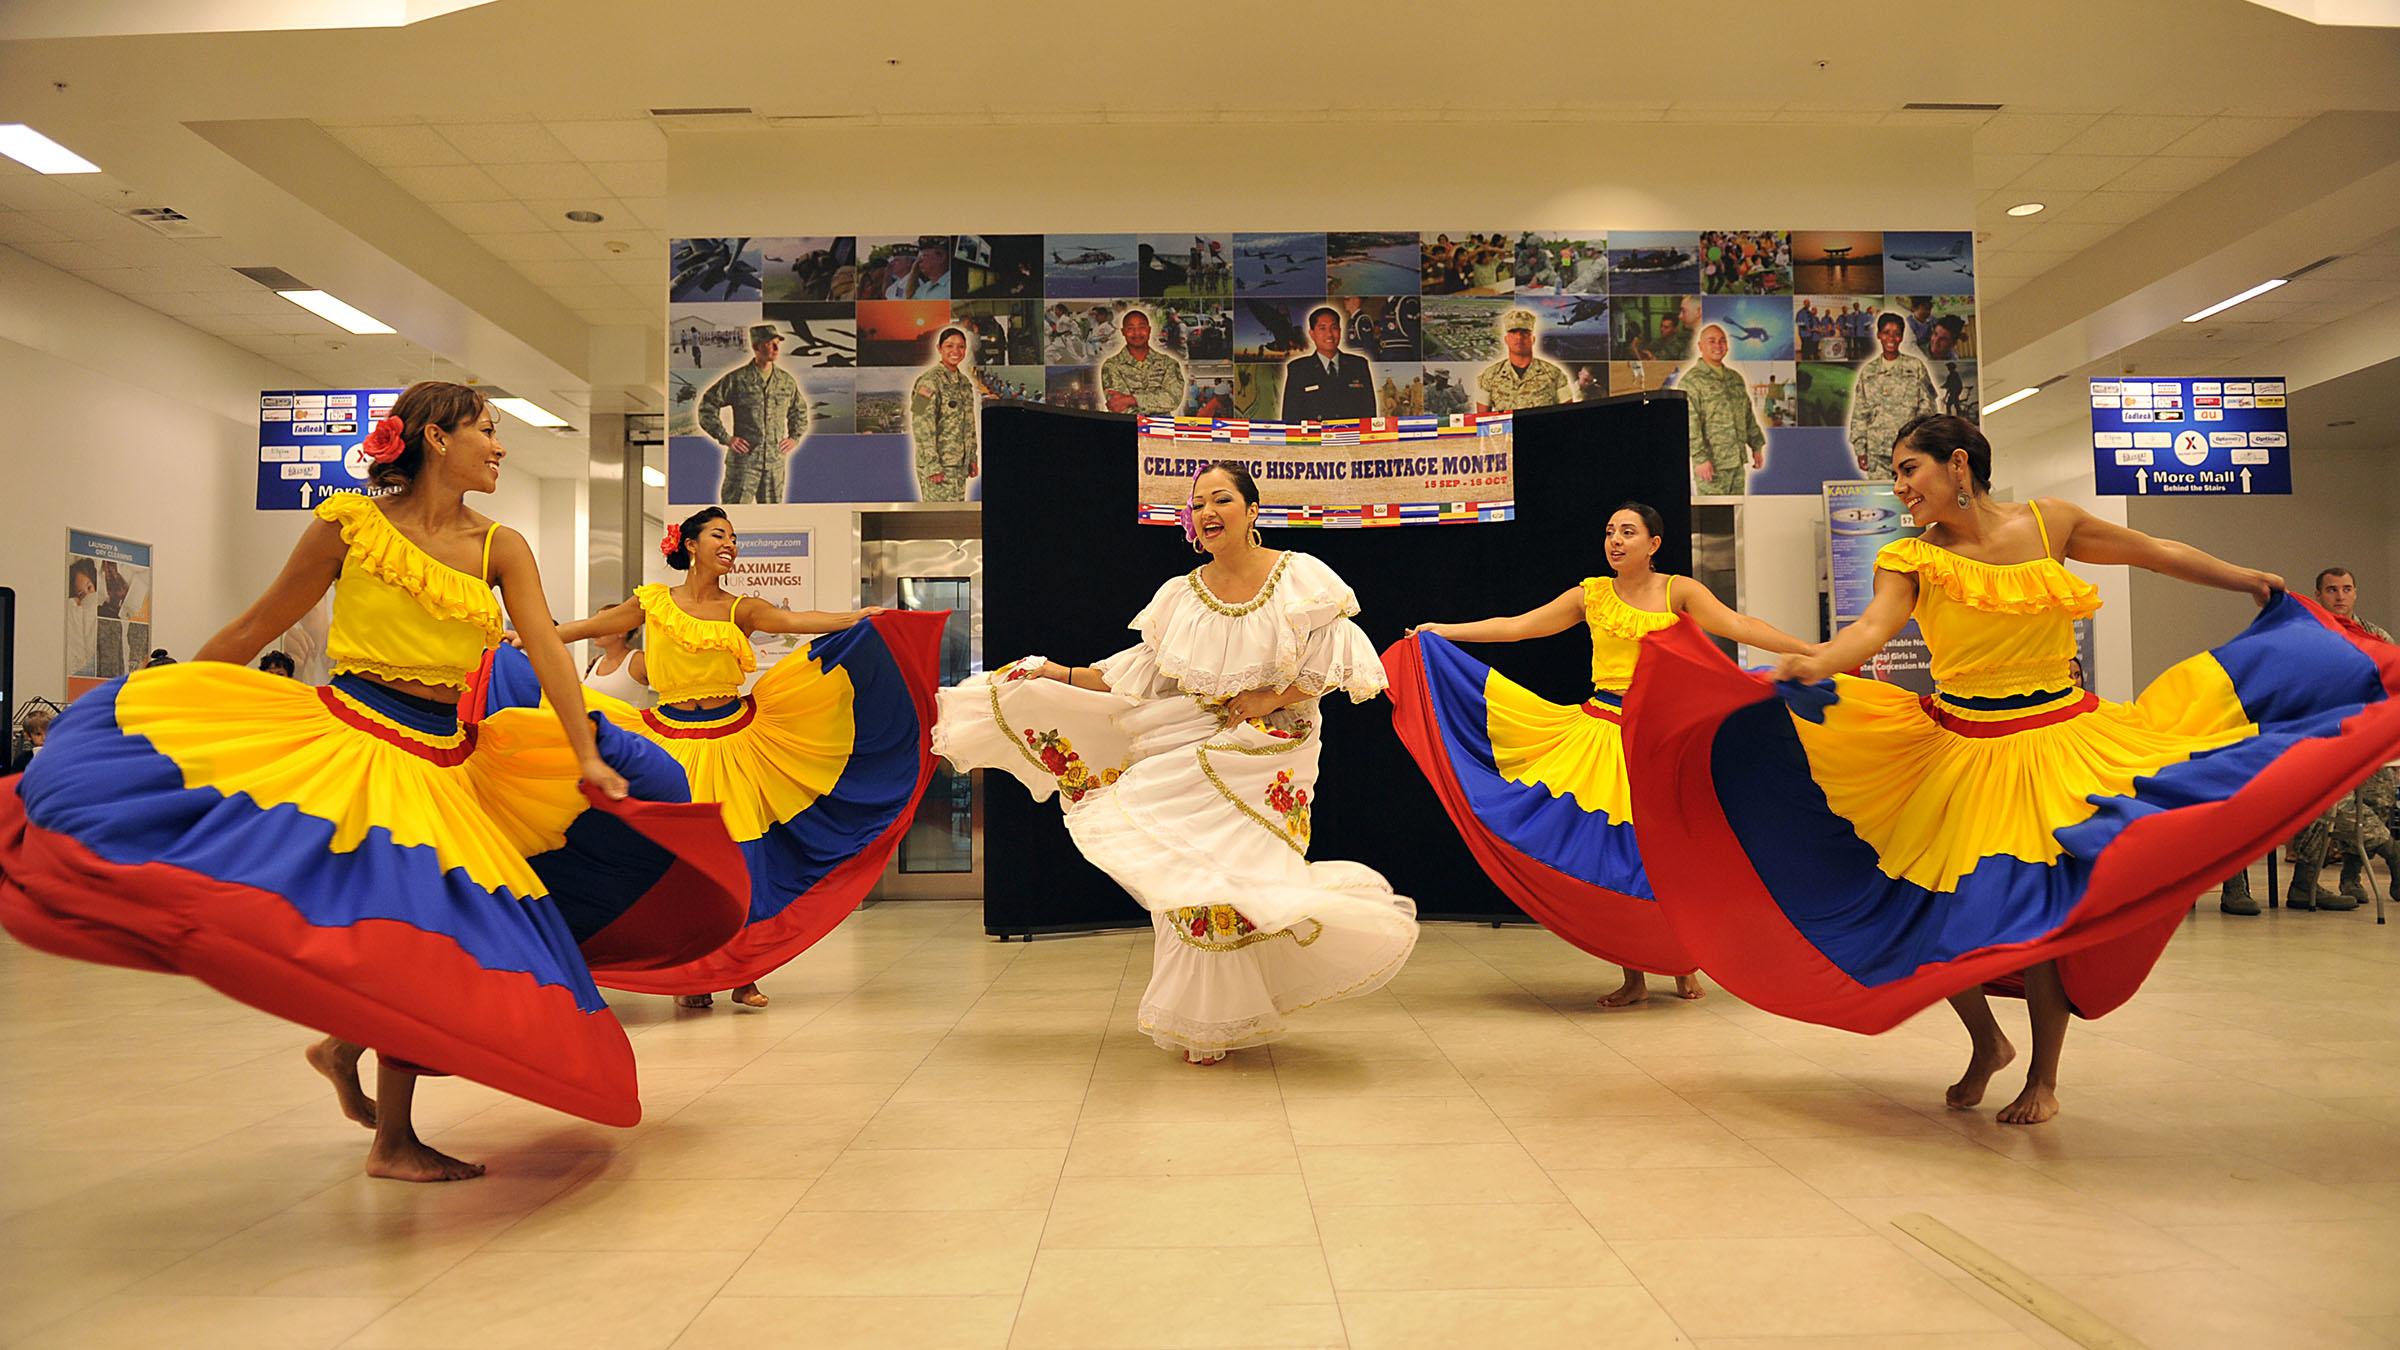 ≫Curso sobre Danza Tradicional SENA ¡Disfruta del baile!